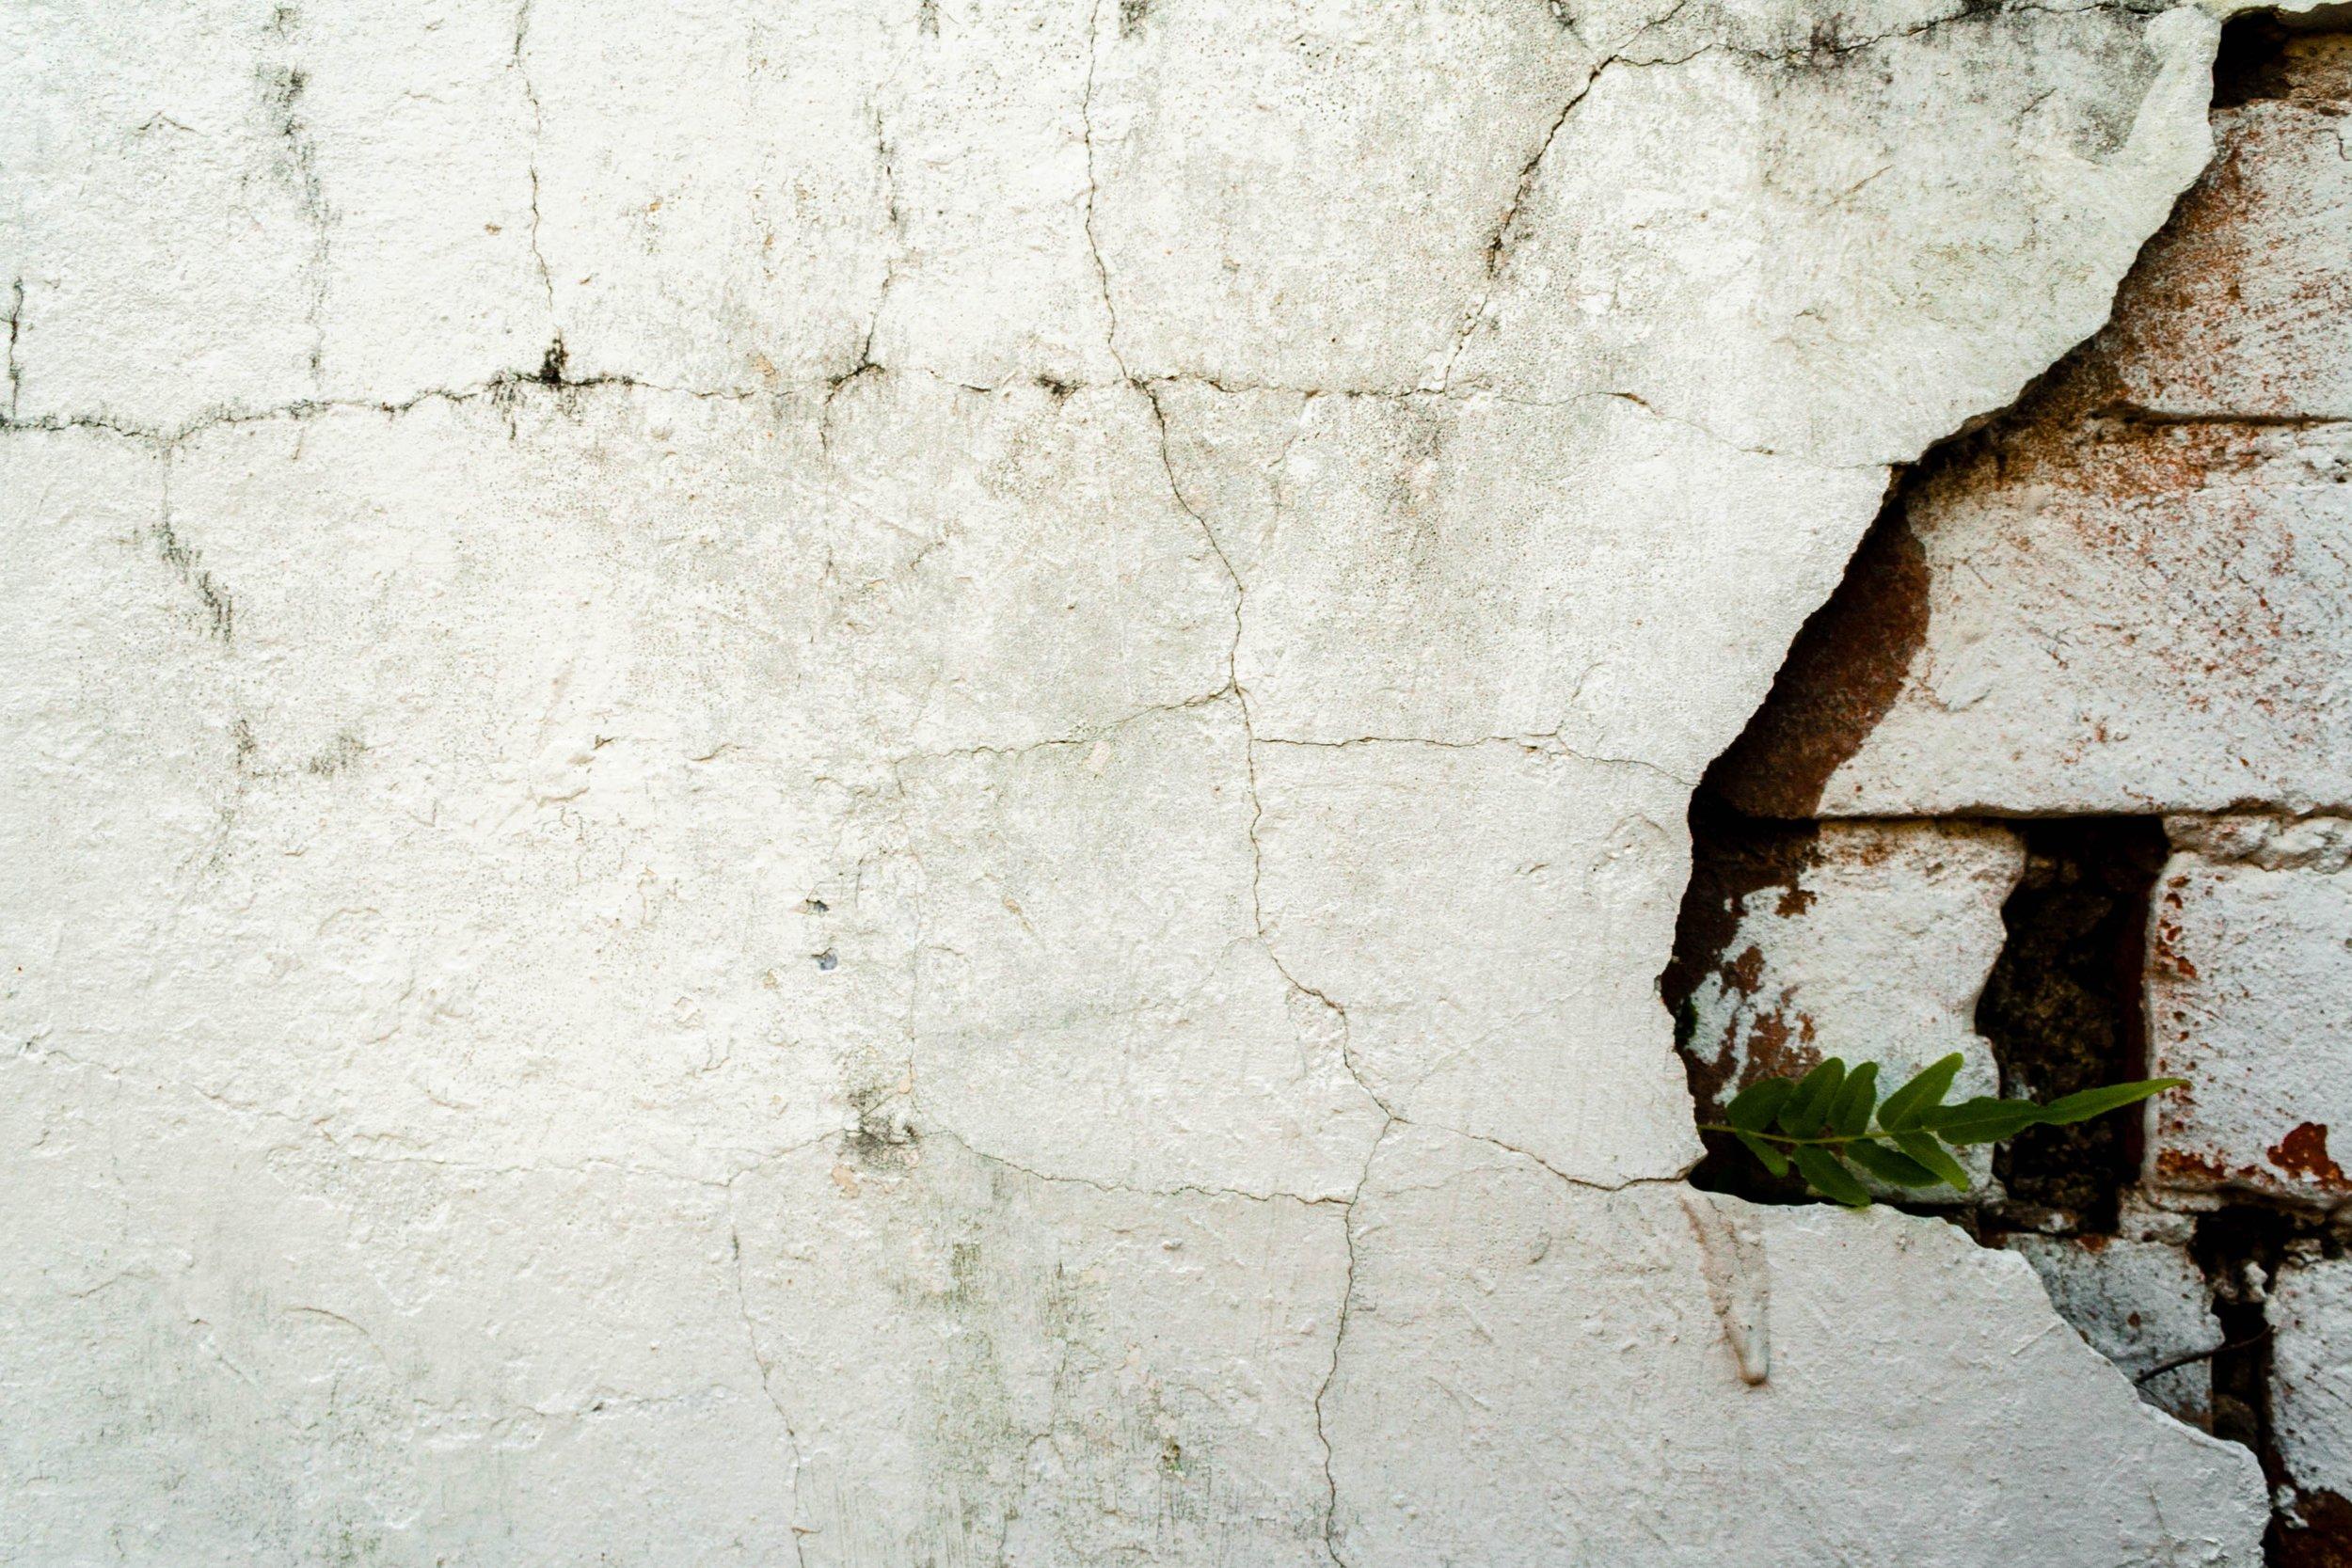 IMG_1950-Cemetary-Wall-NOLA.jpg